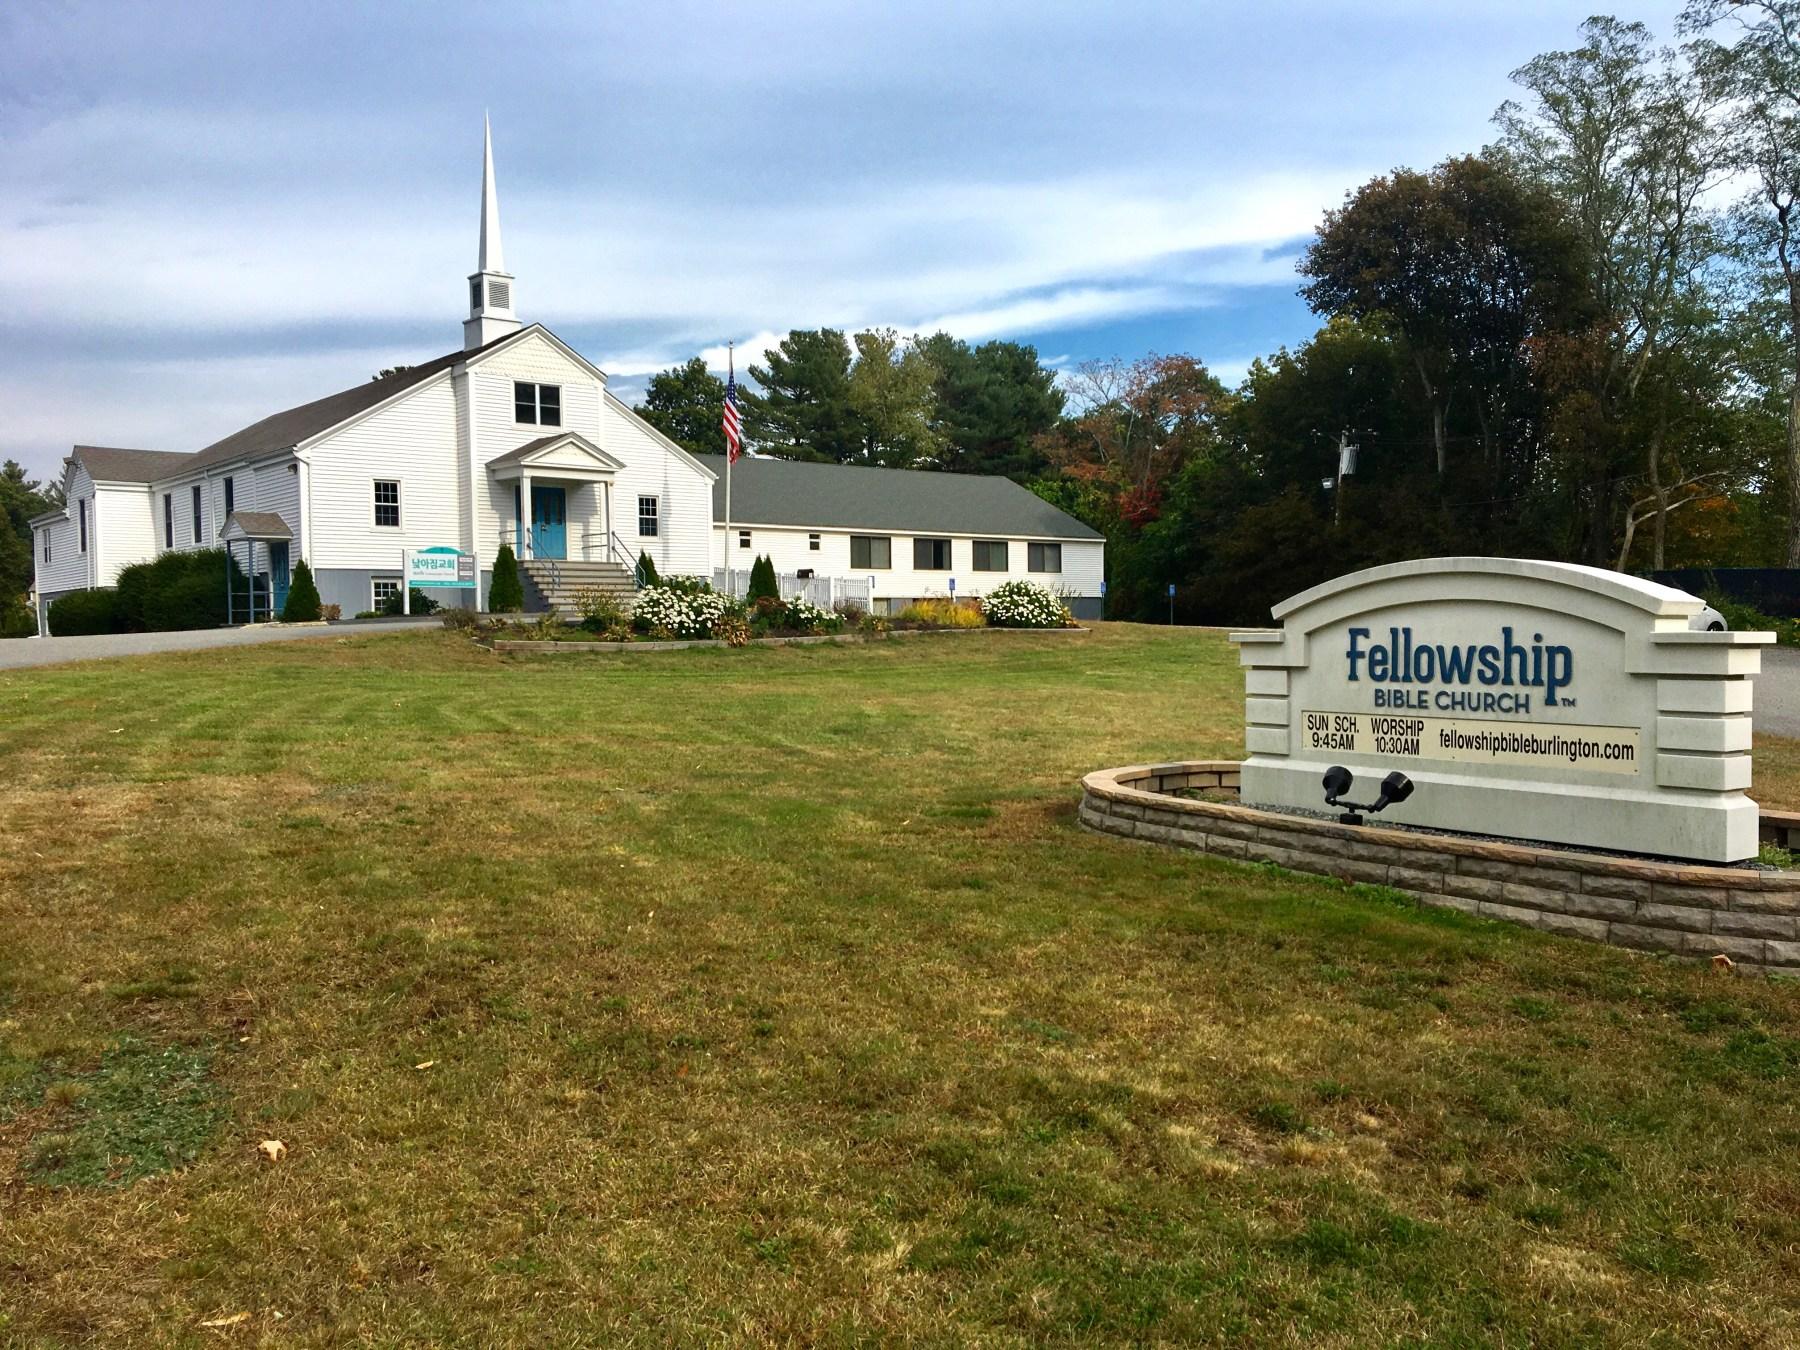 Fellowship Bible Church, Burlington MA